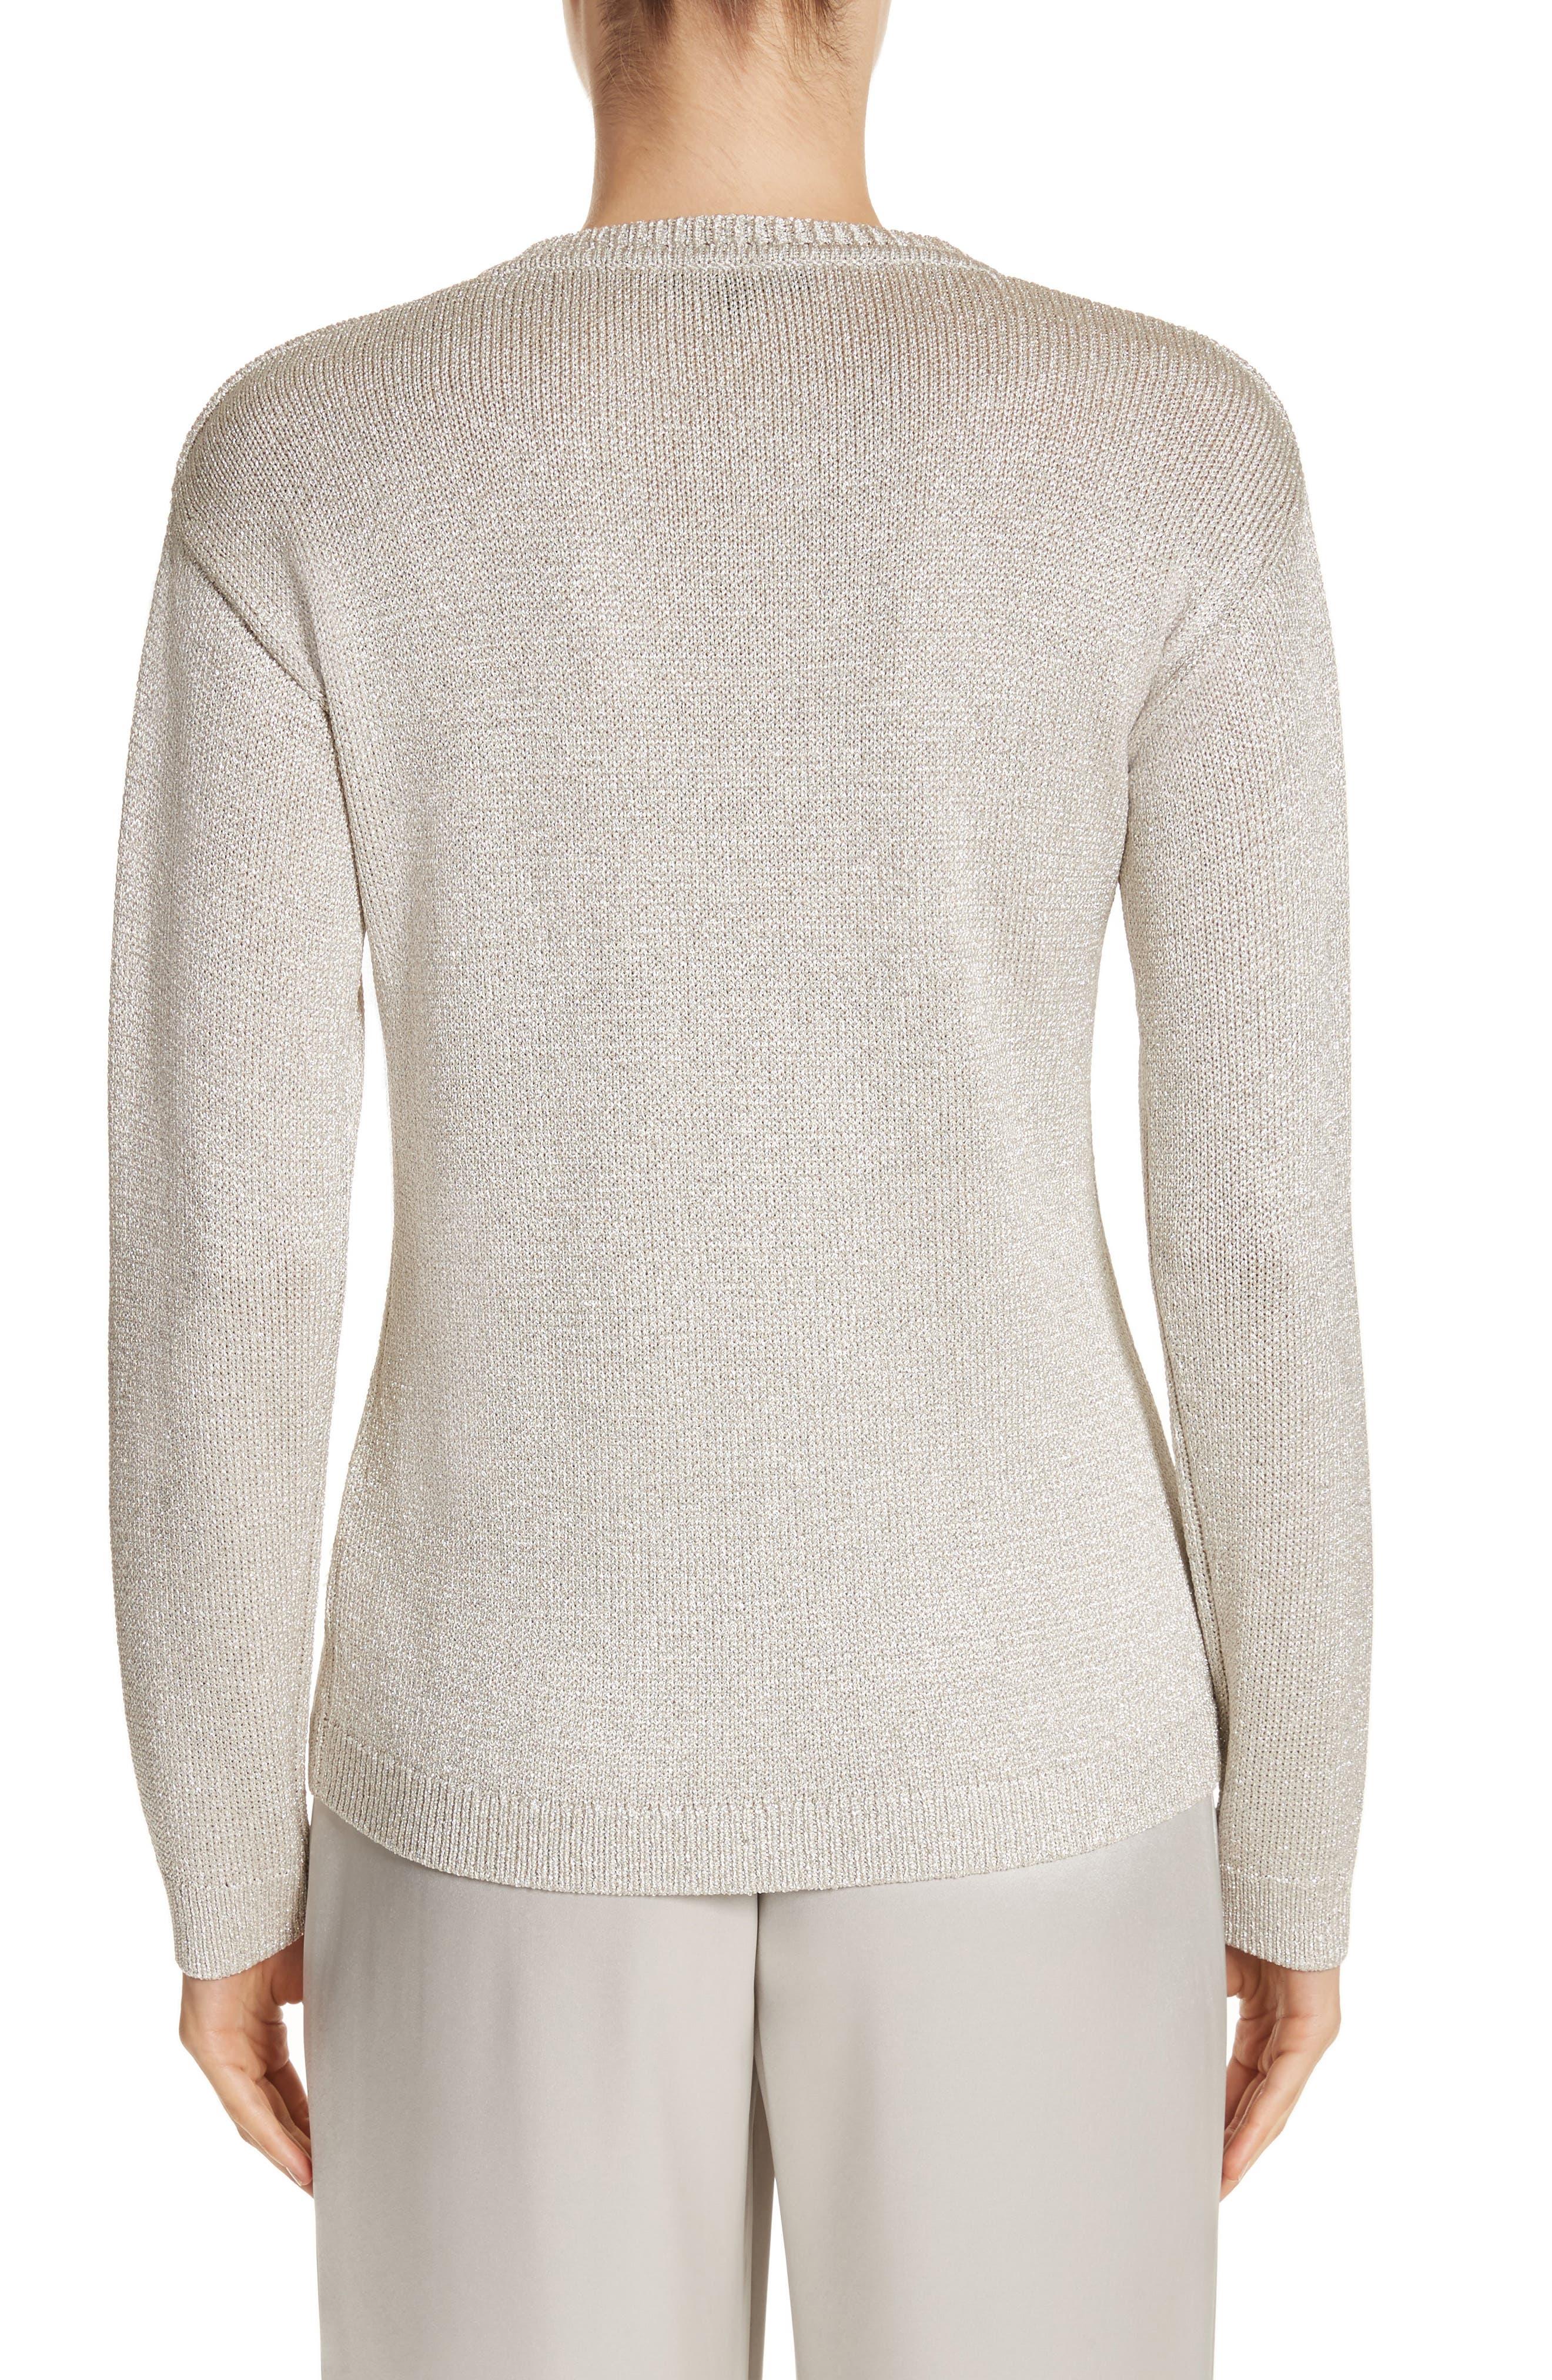 Alternate Image 2  - St John Collection Metallic Jersey Knit Sweater